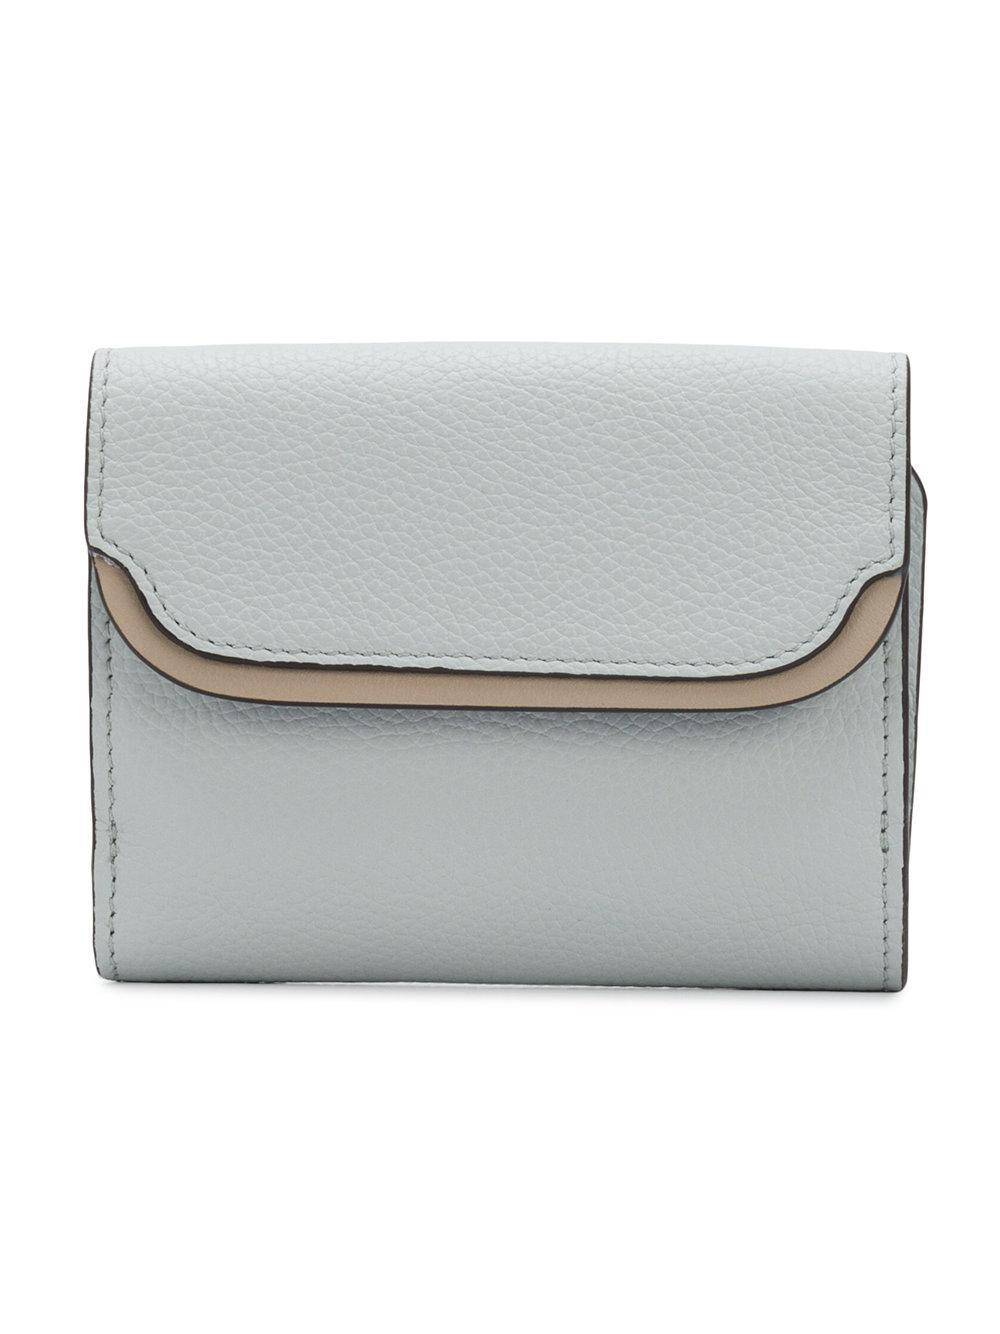 82d6fb0b0750 Chloé Easy Small Tri-fold Wallet in Gray - Lyst